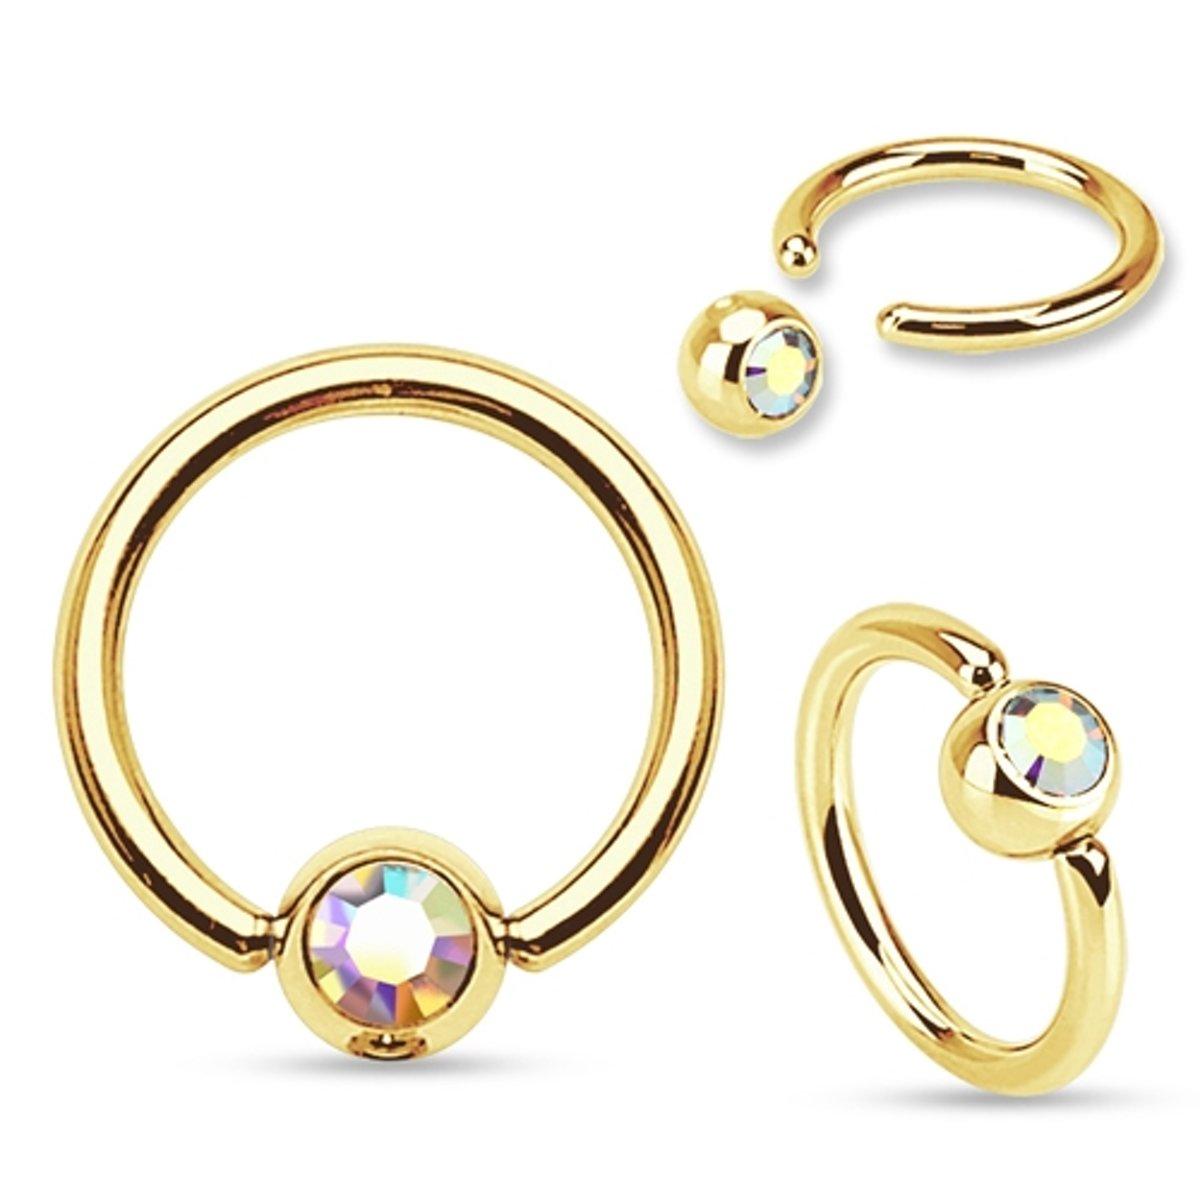 Septumpiercing ring gold plated multi kleur steentje ©LMPiercings kopen